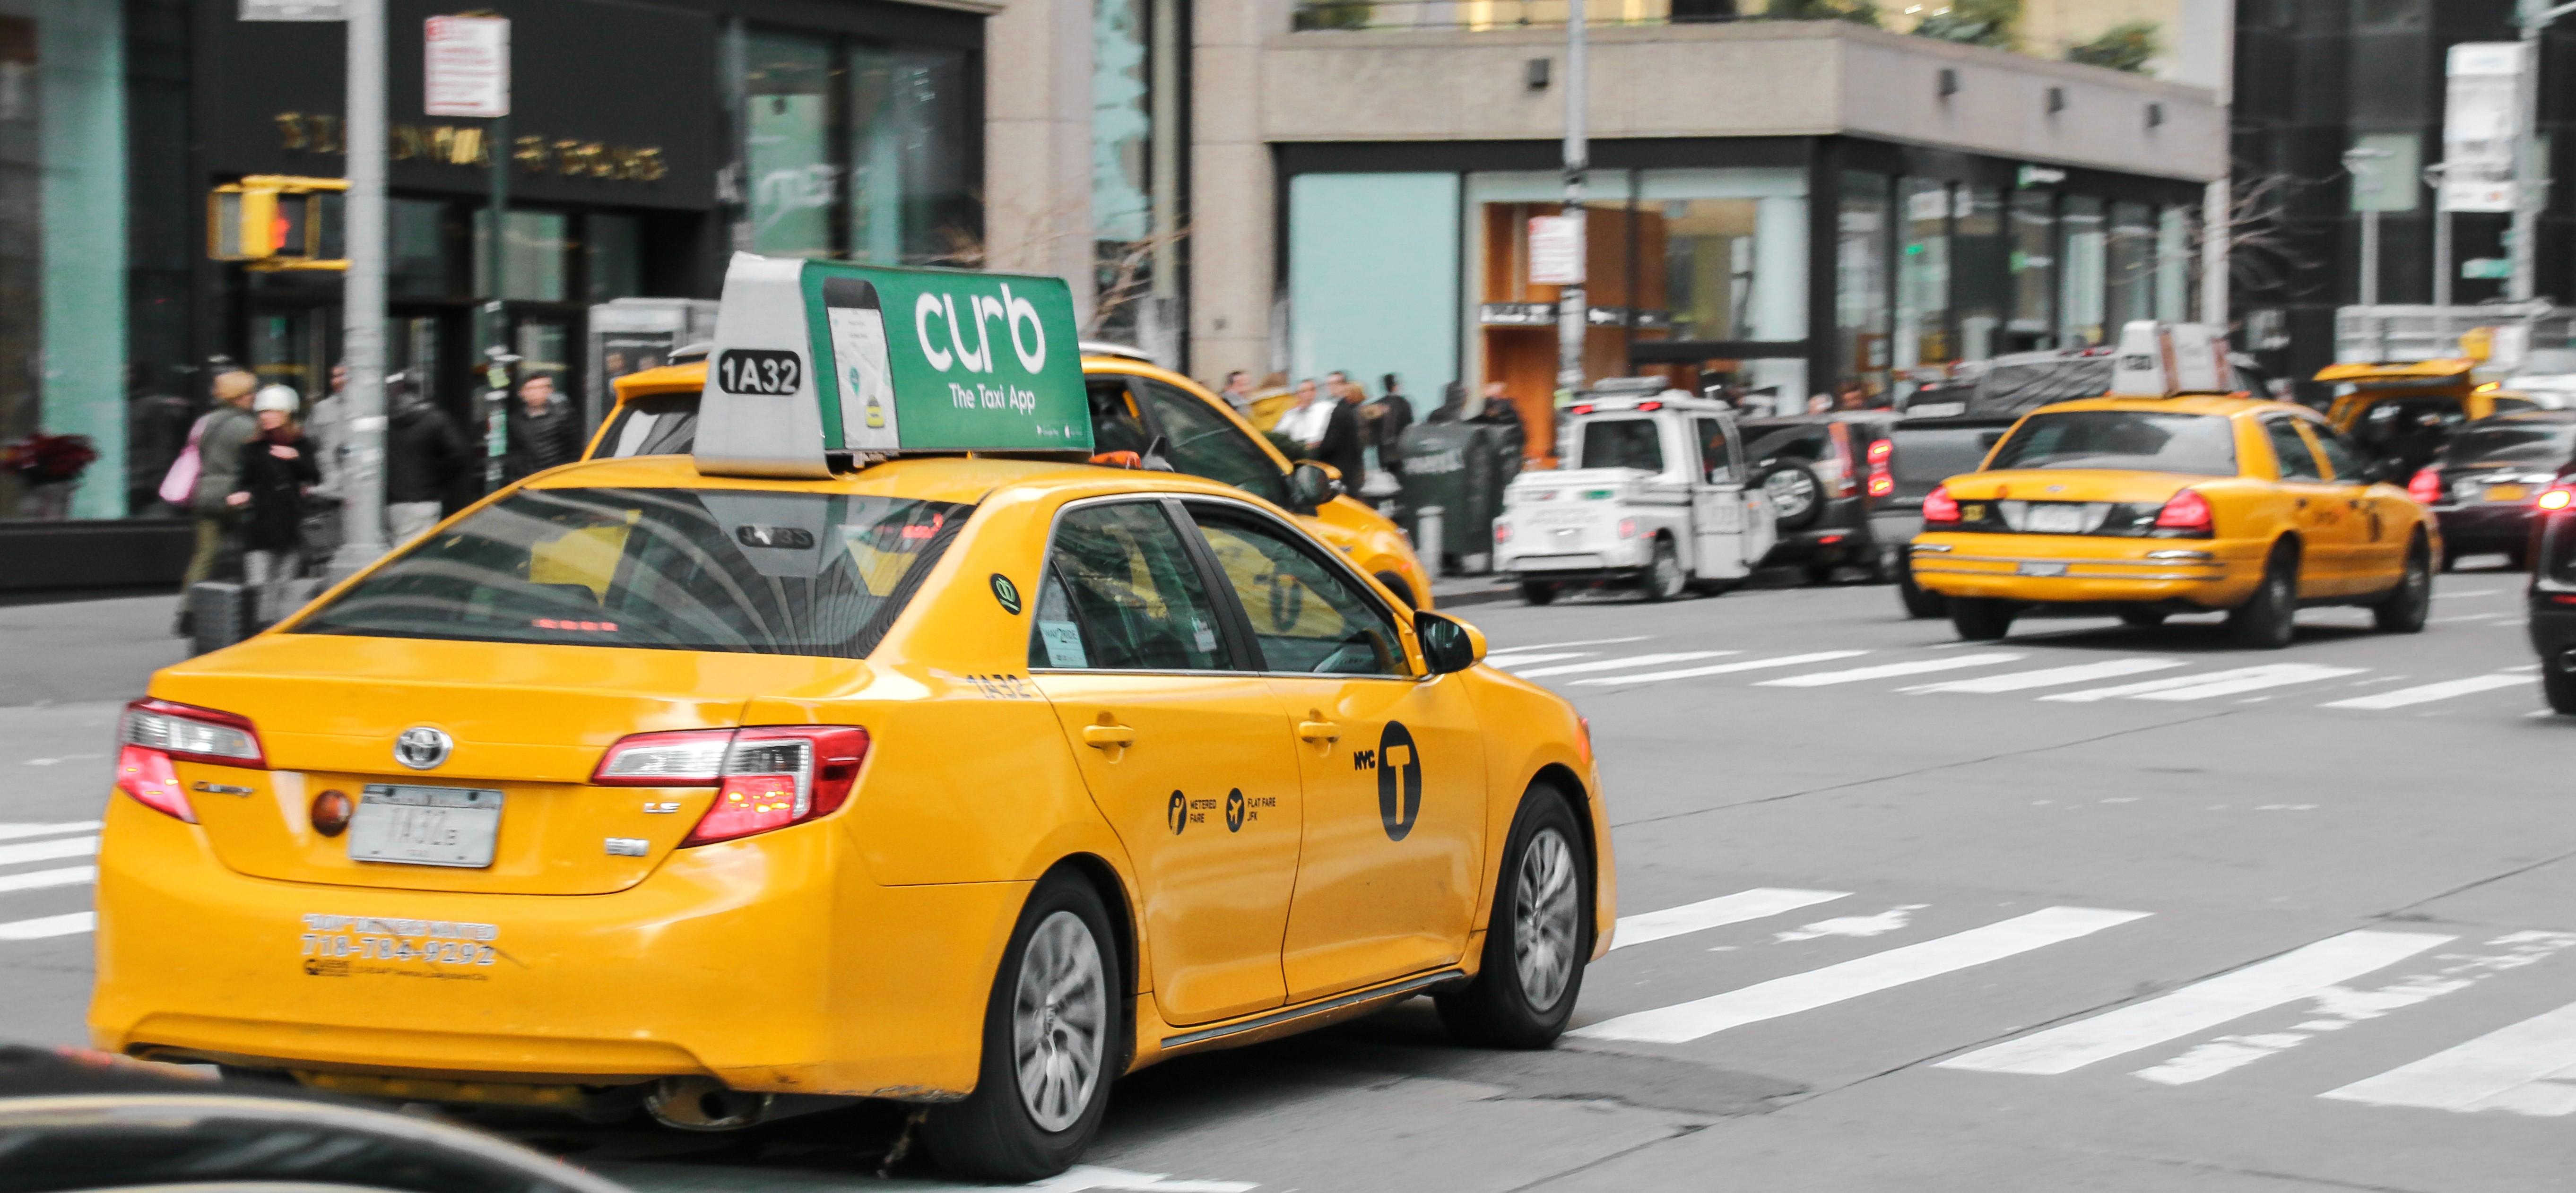 Curb Mobility | LinkedIn